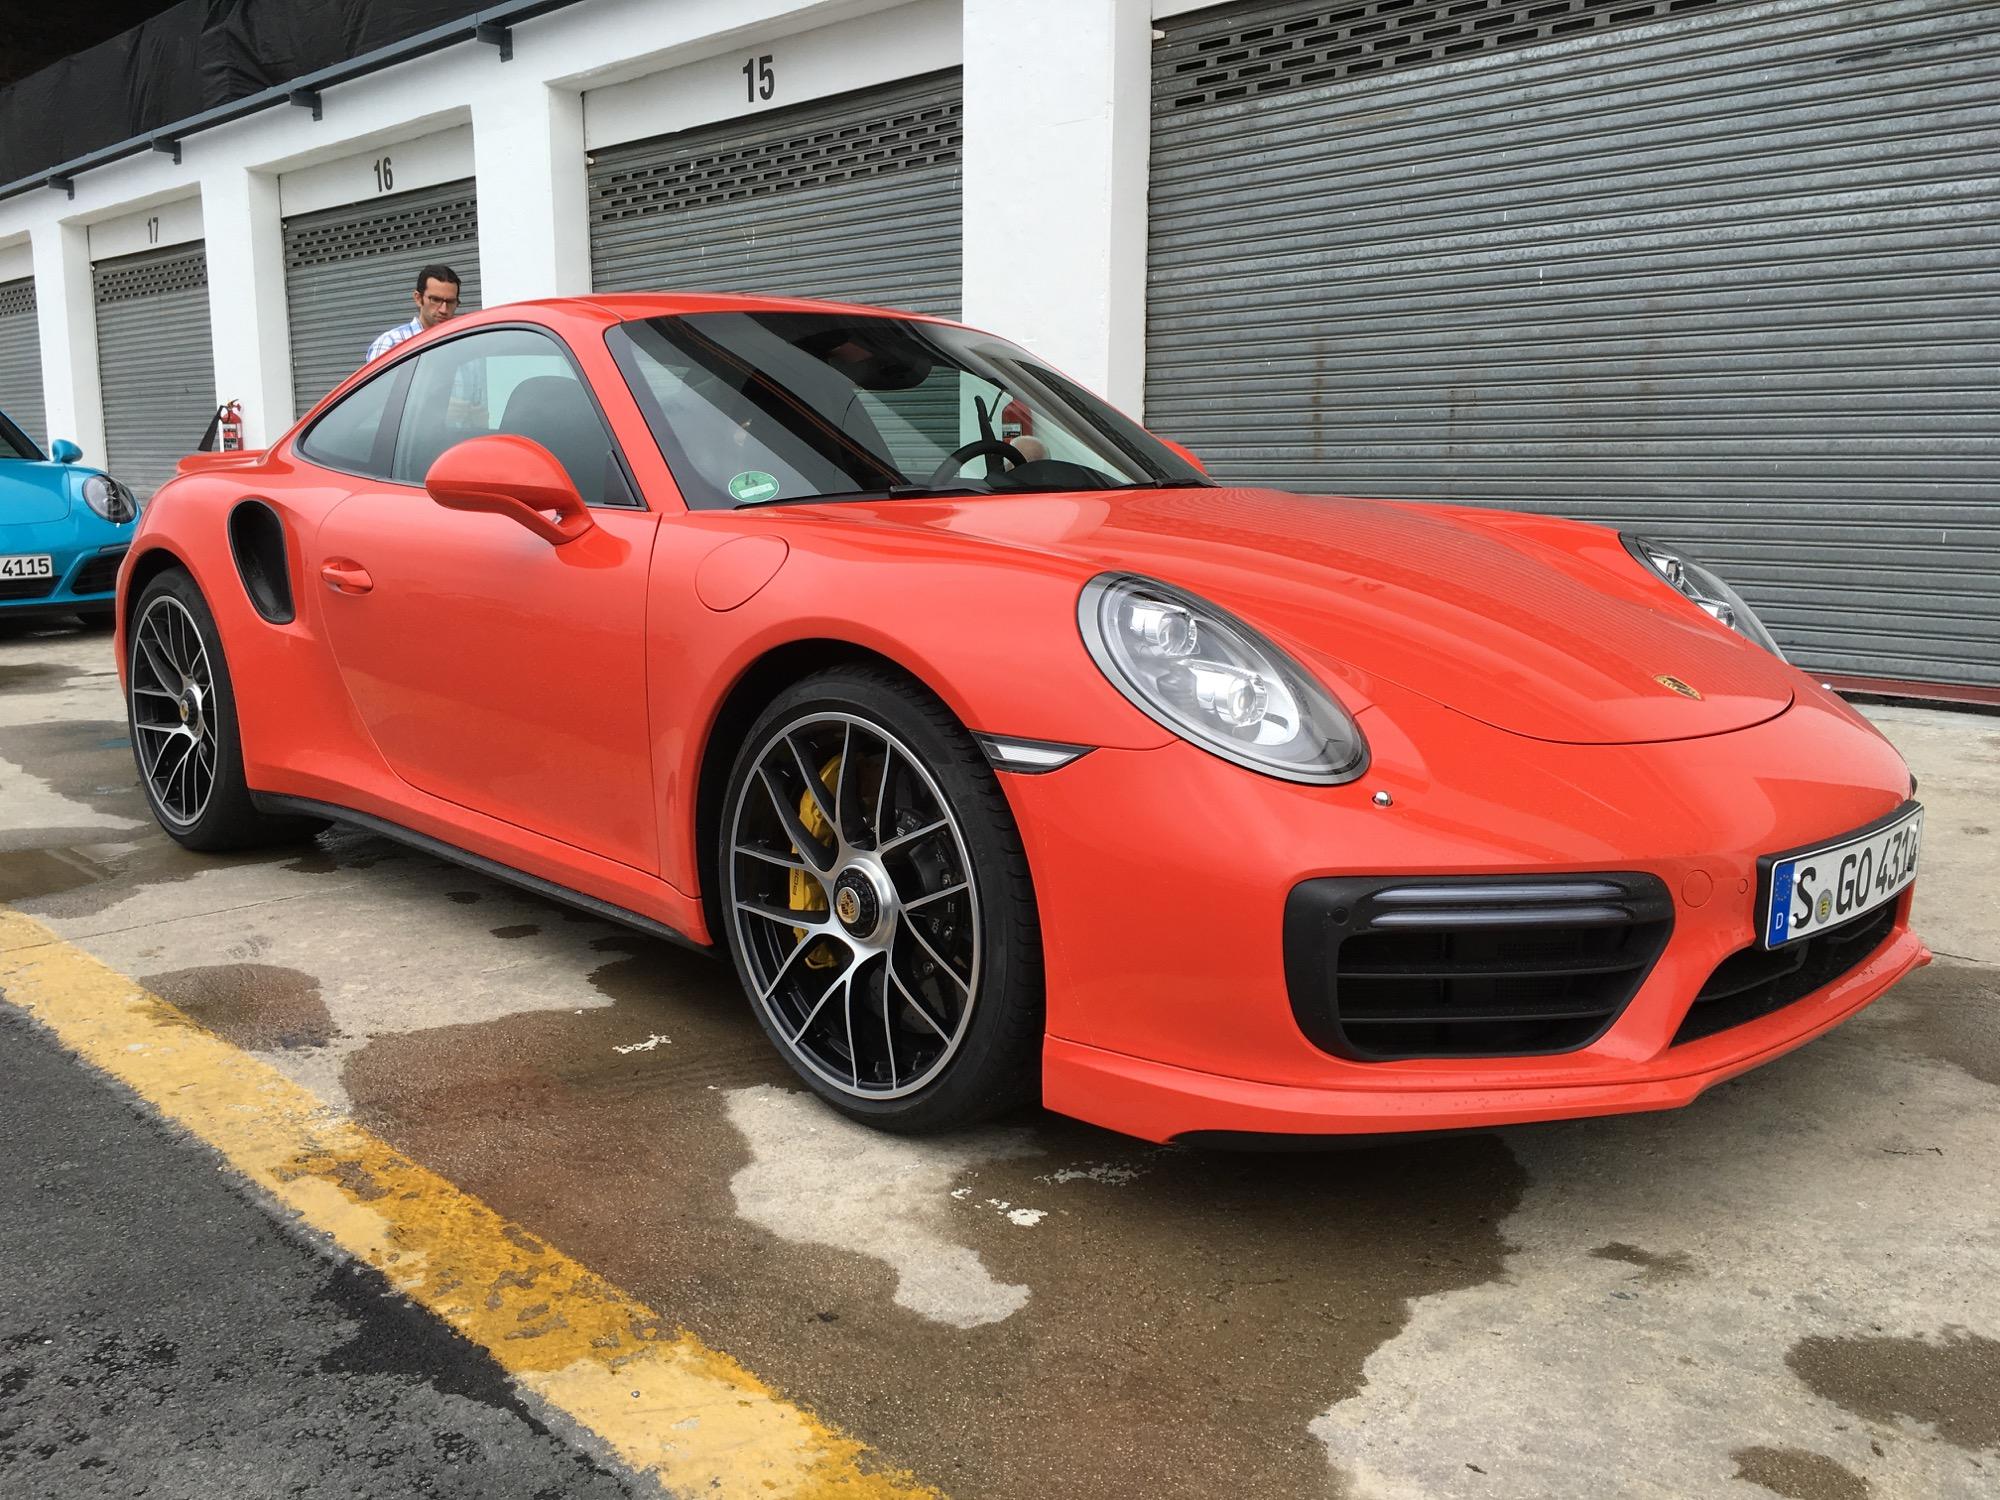 2016 Porsche 911 Turbo And Turbo S Review Photos Caradvice